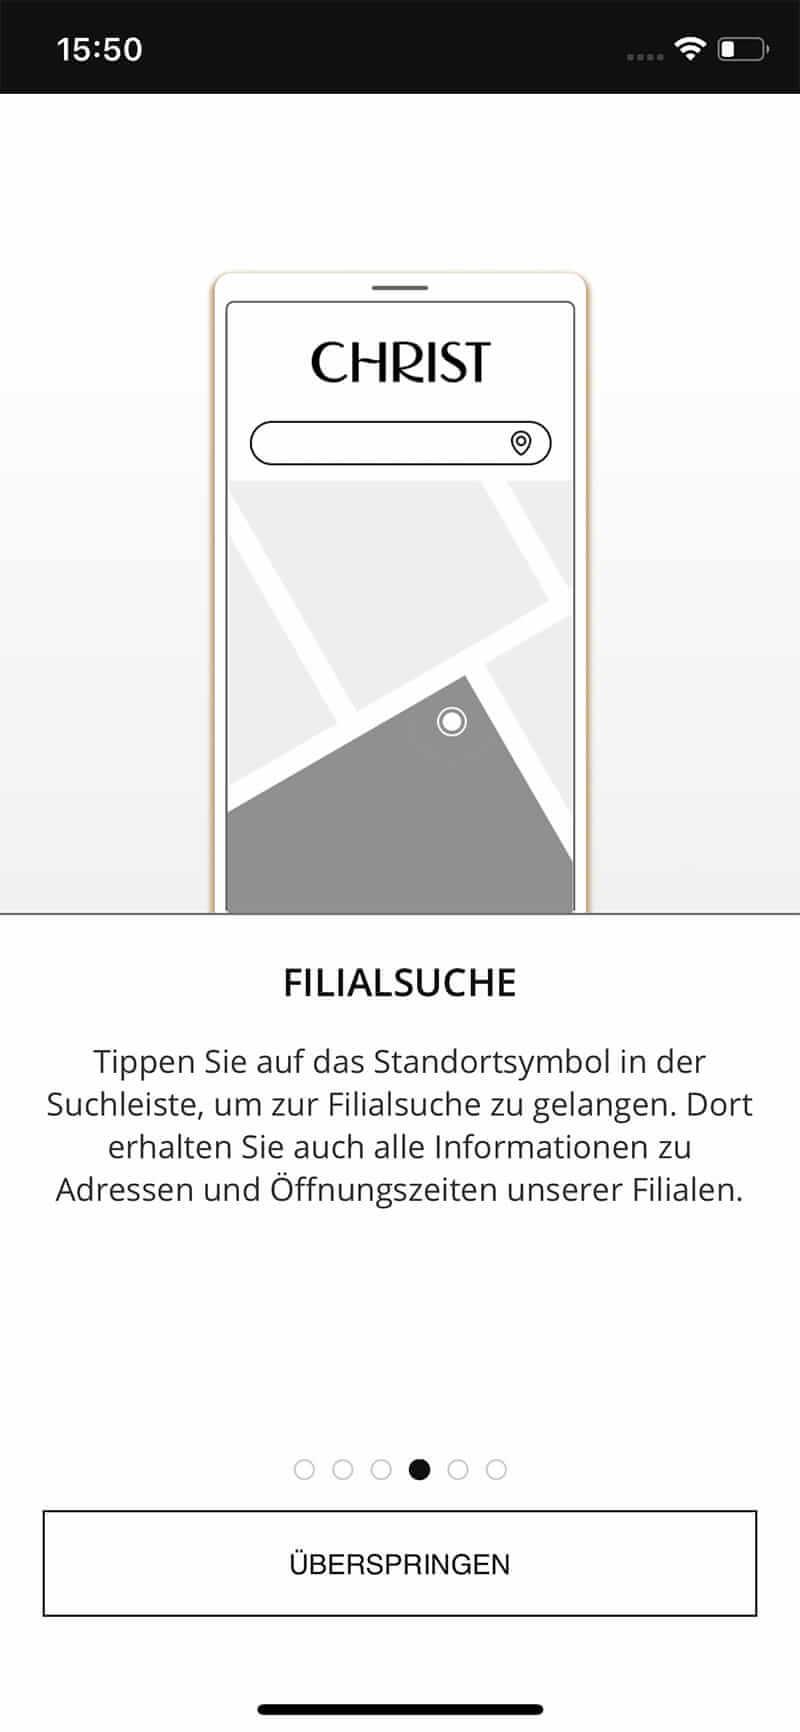 Christ-App_Filialsuche